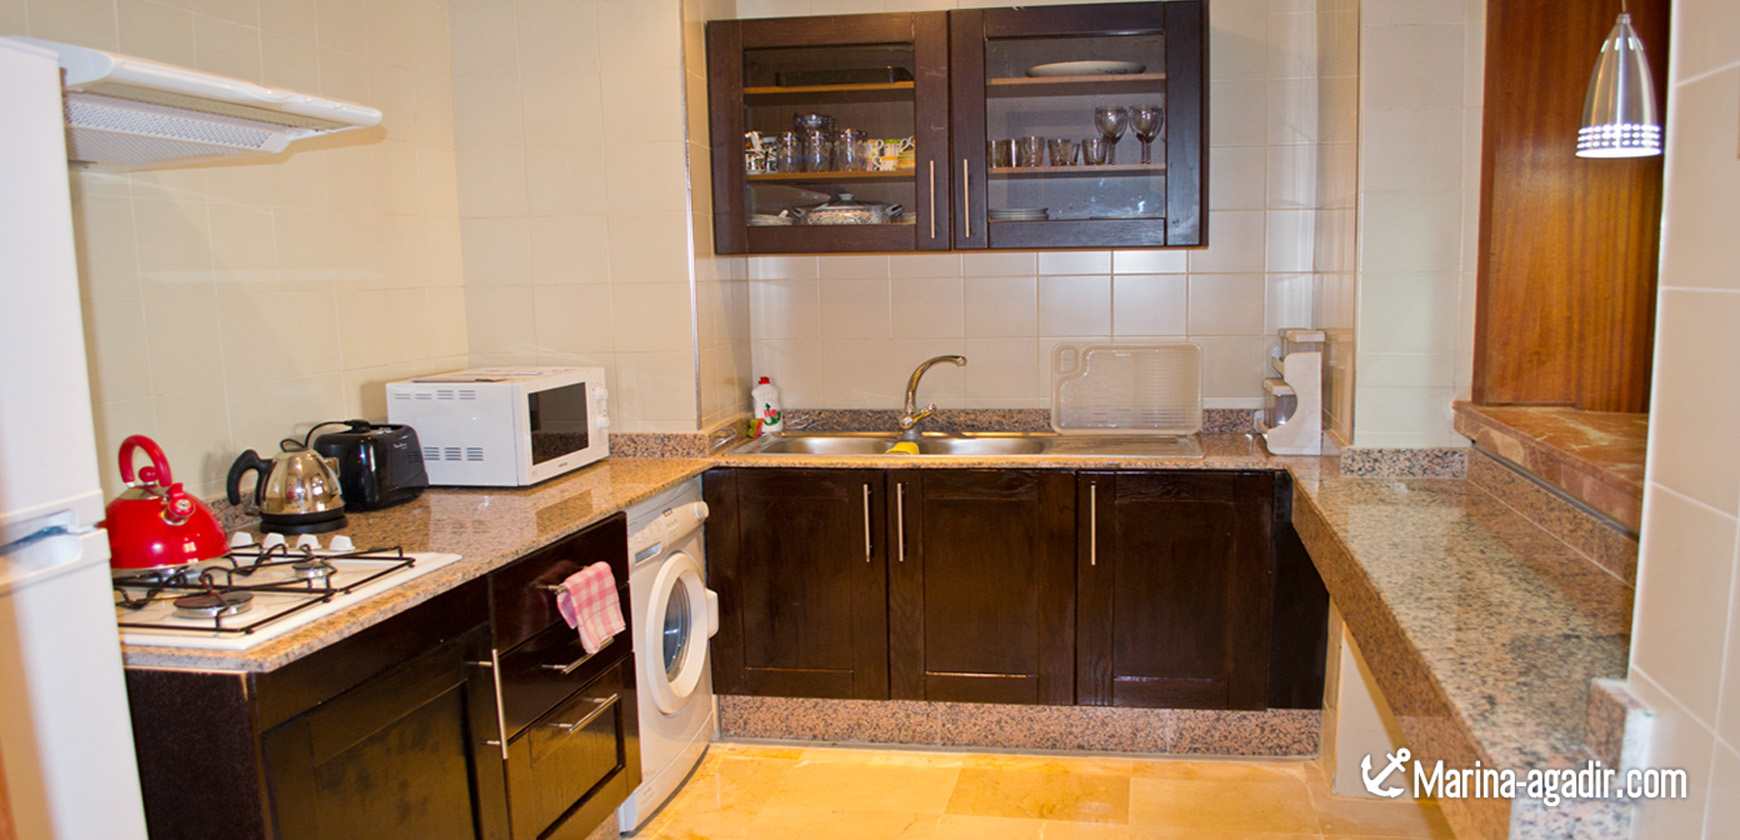 Location Appartement Marina Agadir